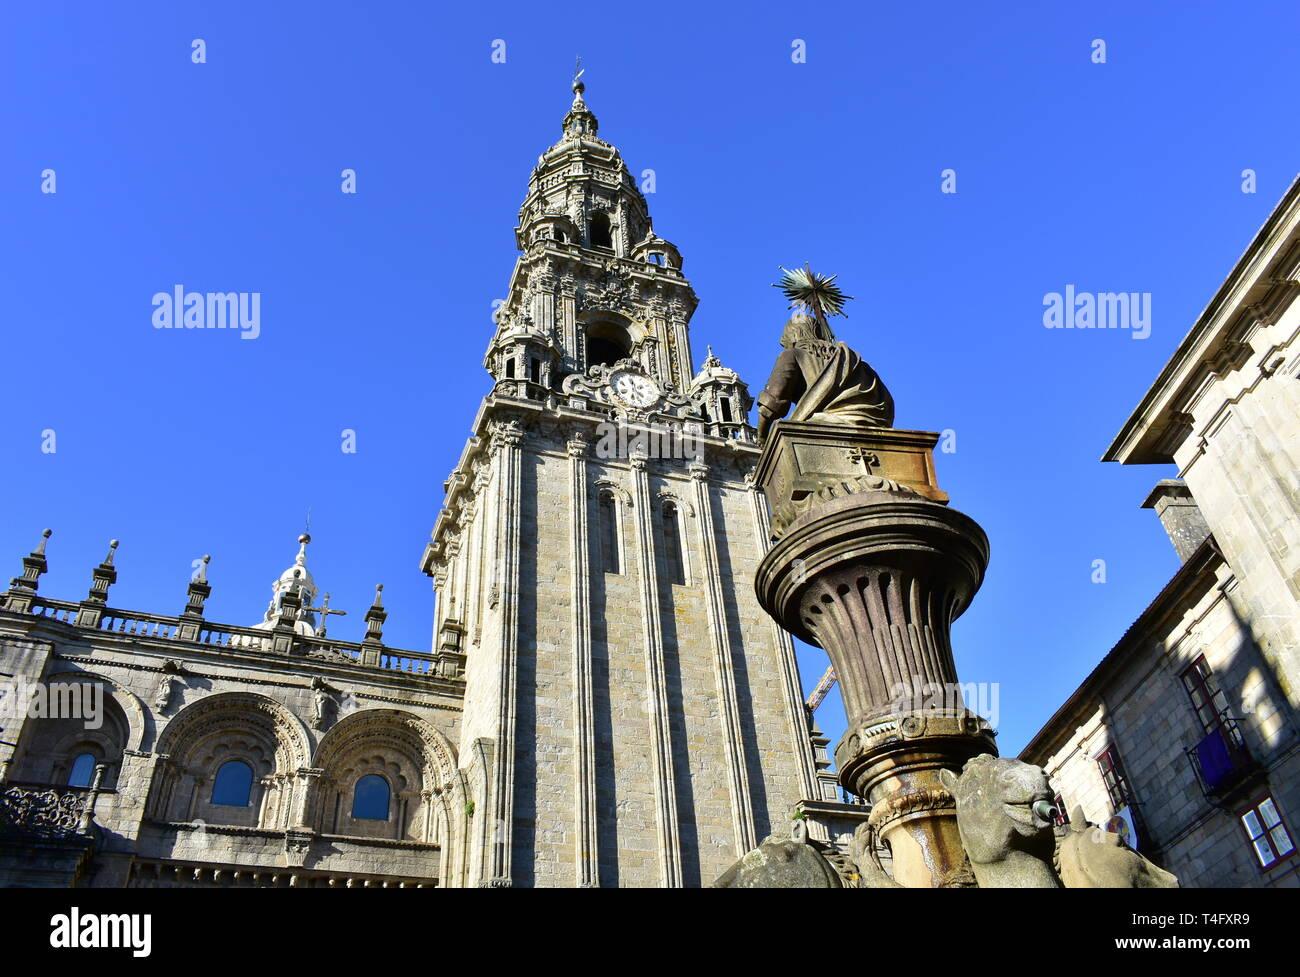 Cathedral, romanesque Platerias facade and baroque clock tower with stone horses fountain and blue sky. Santiago de Compostela, Spain. Stock Photo